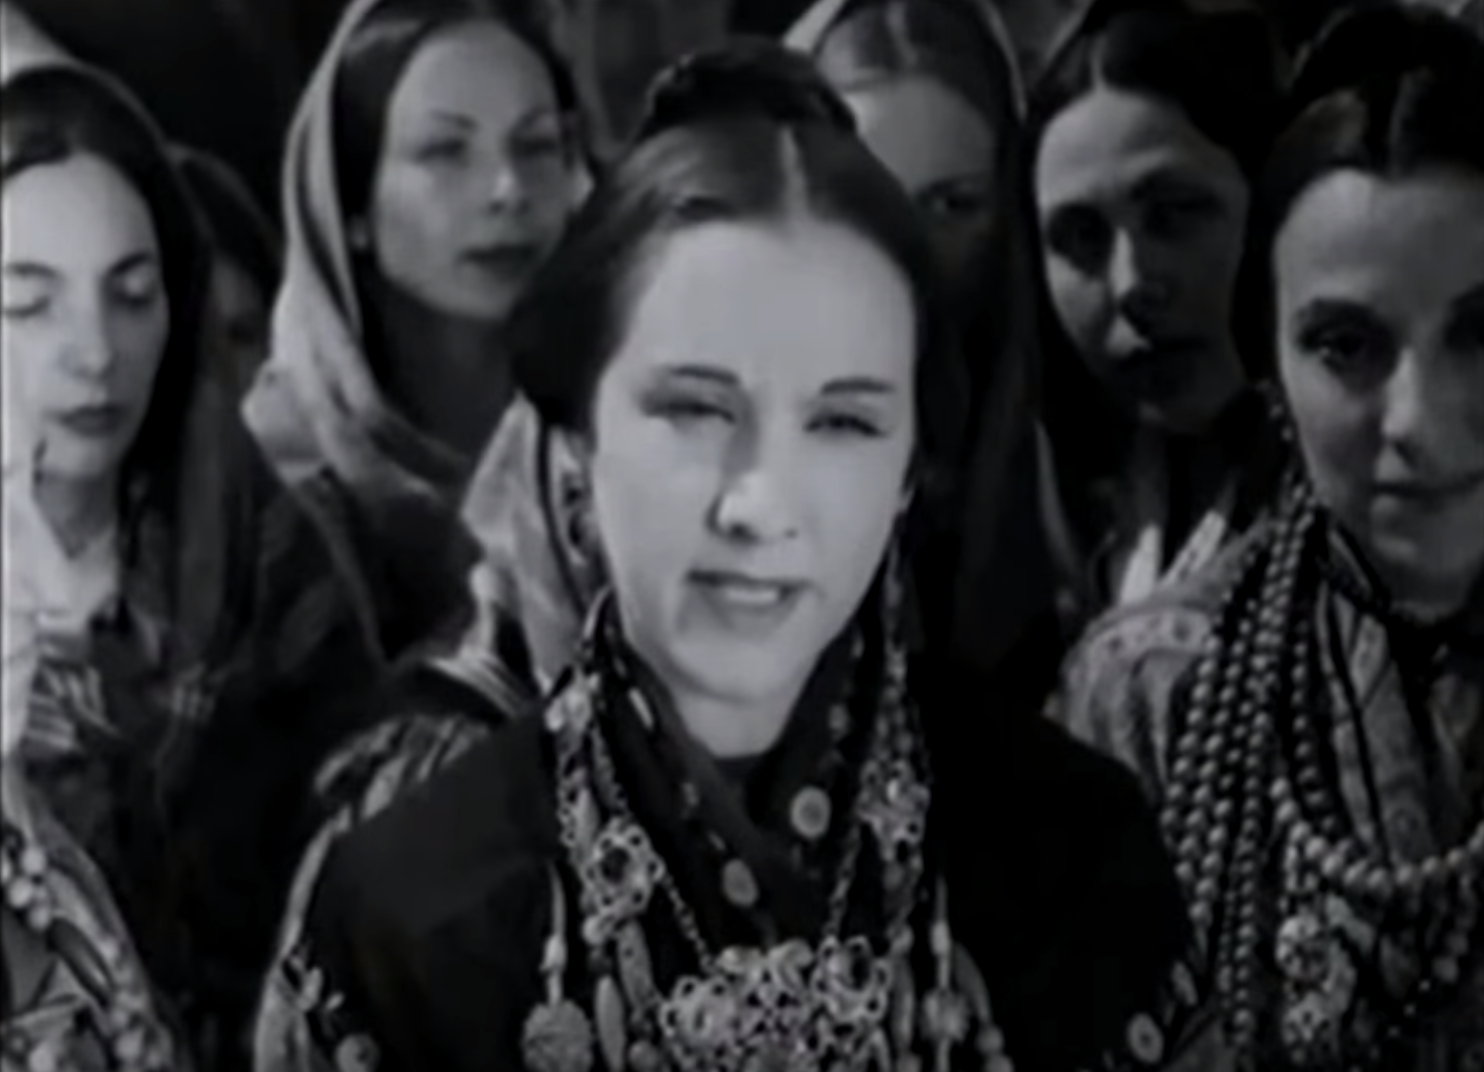 Fotograma de 'La Esfinge Maragata' (1950), protagonizada por Paquita de la Ronda. Foto: Youtube.